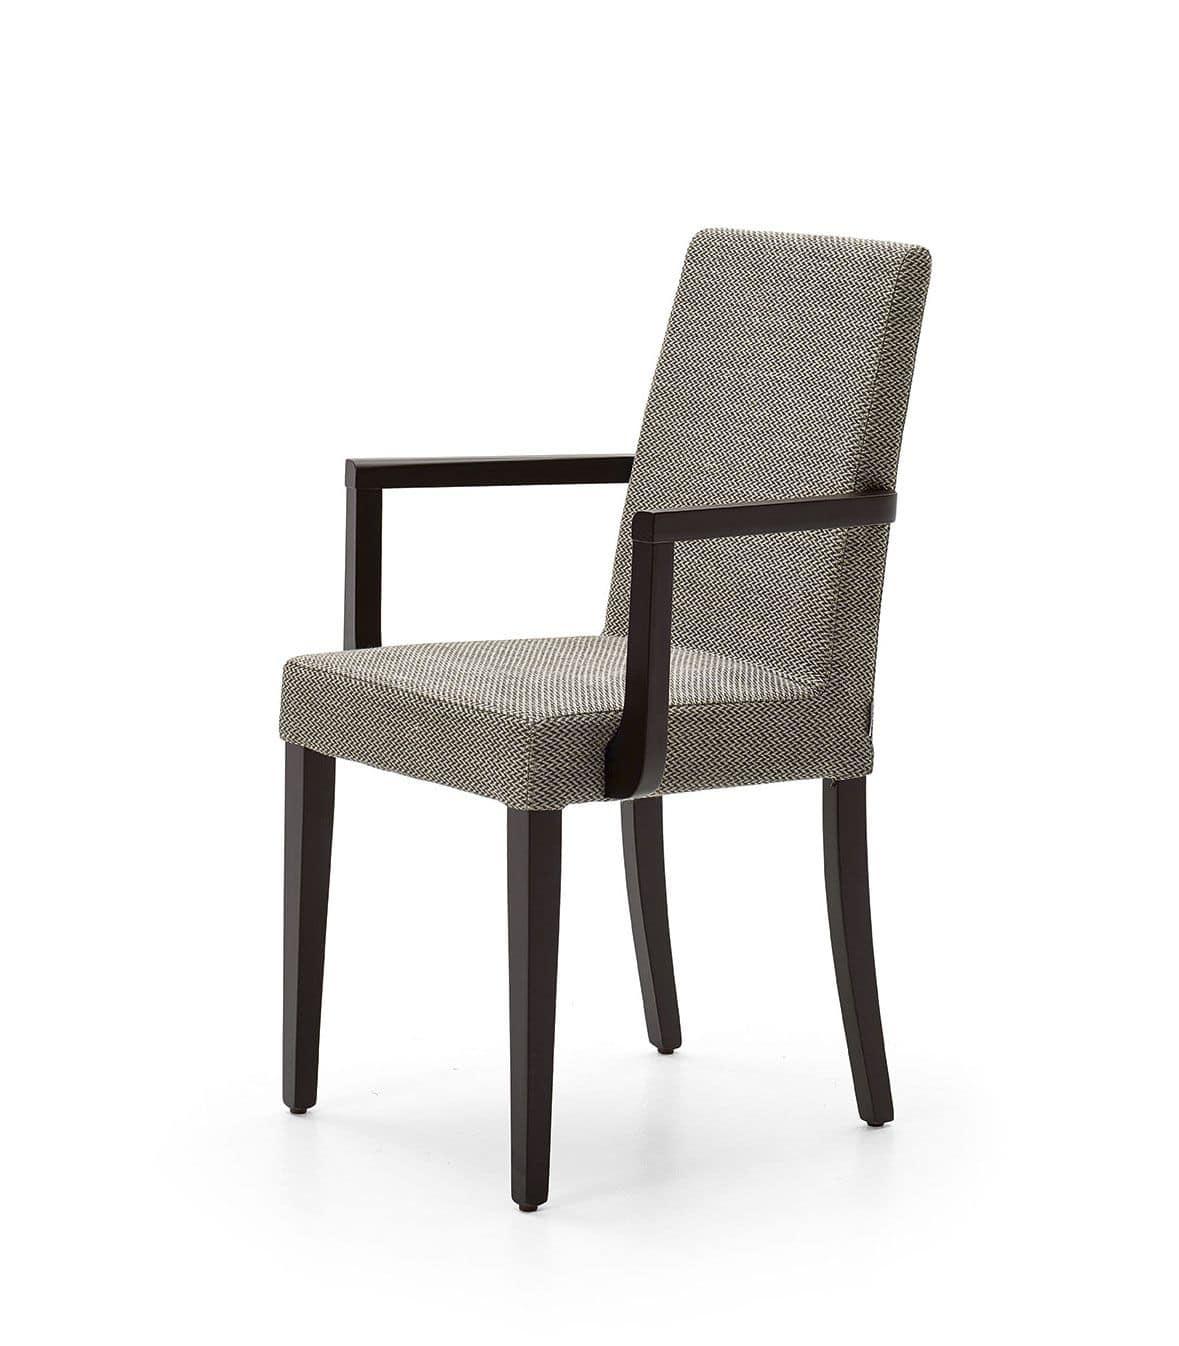 Sedia imbottita con braccioli, per sala da pranzo | IDFdesign